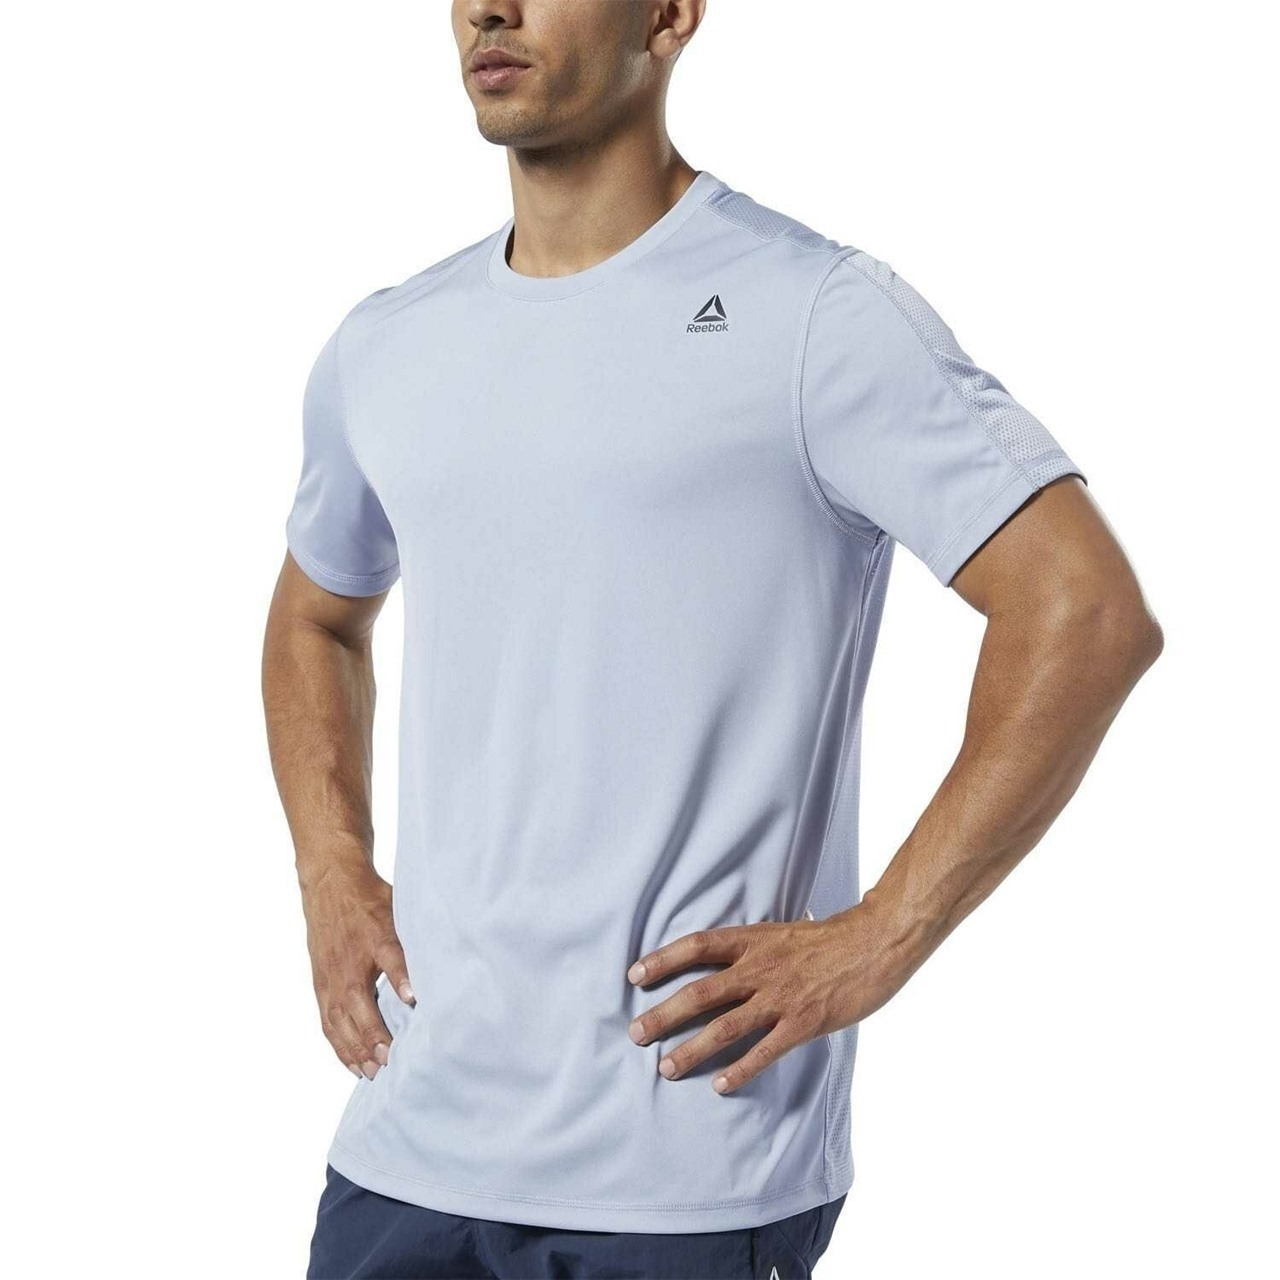 Reebok Wor Tech T-Shirt - Gri